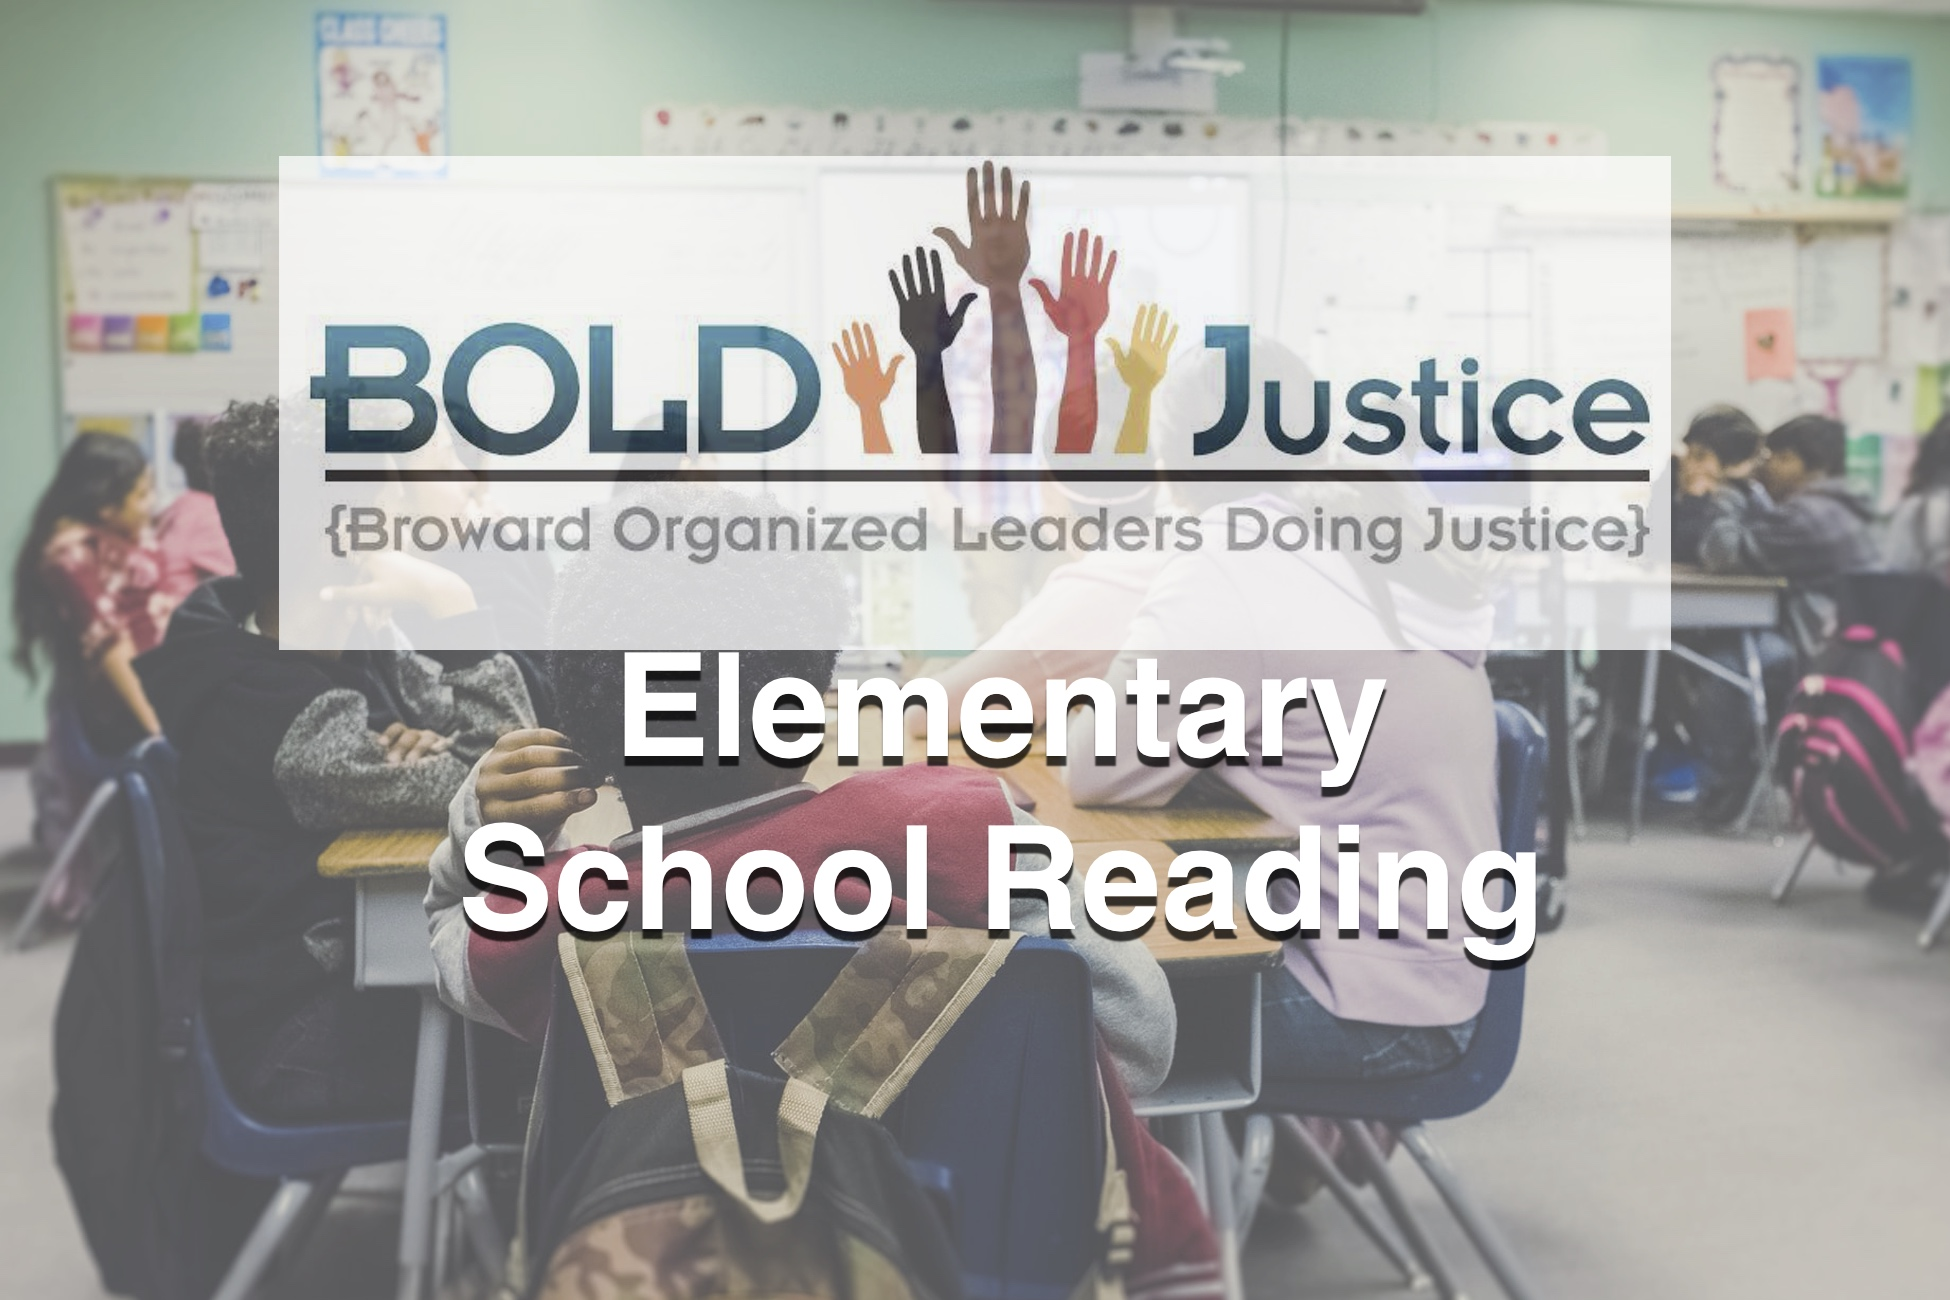 Elementary-School-Reading-1.jpg